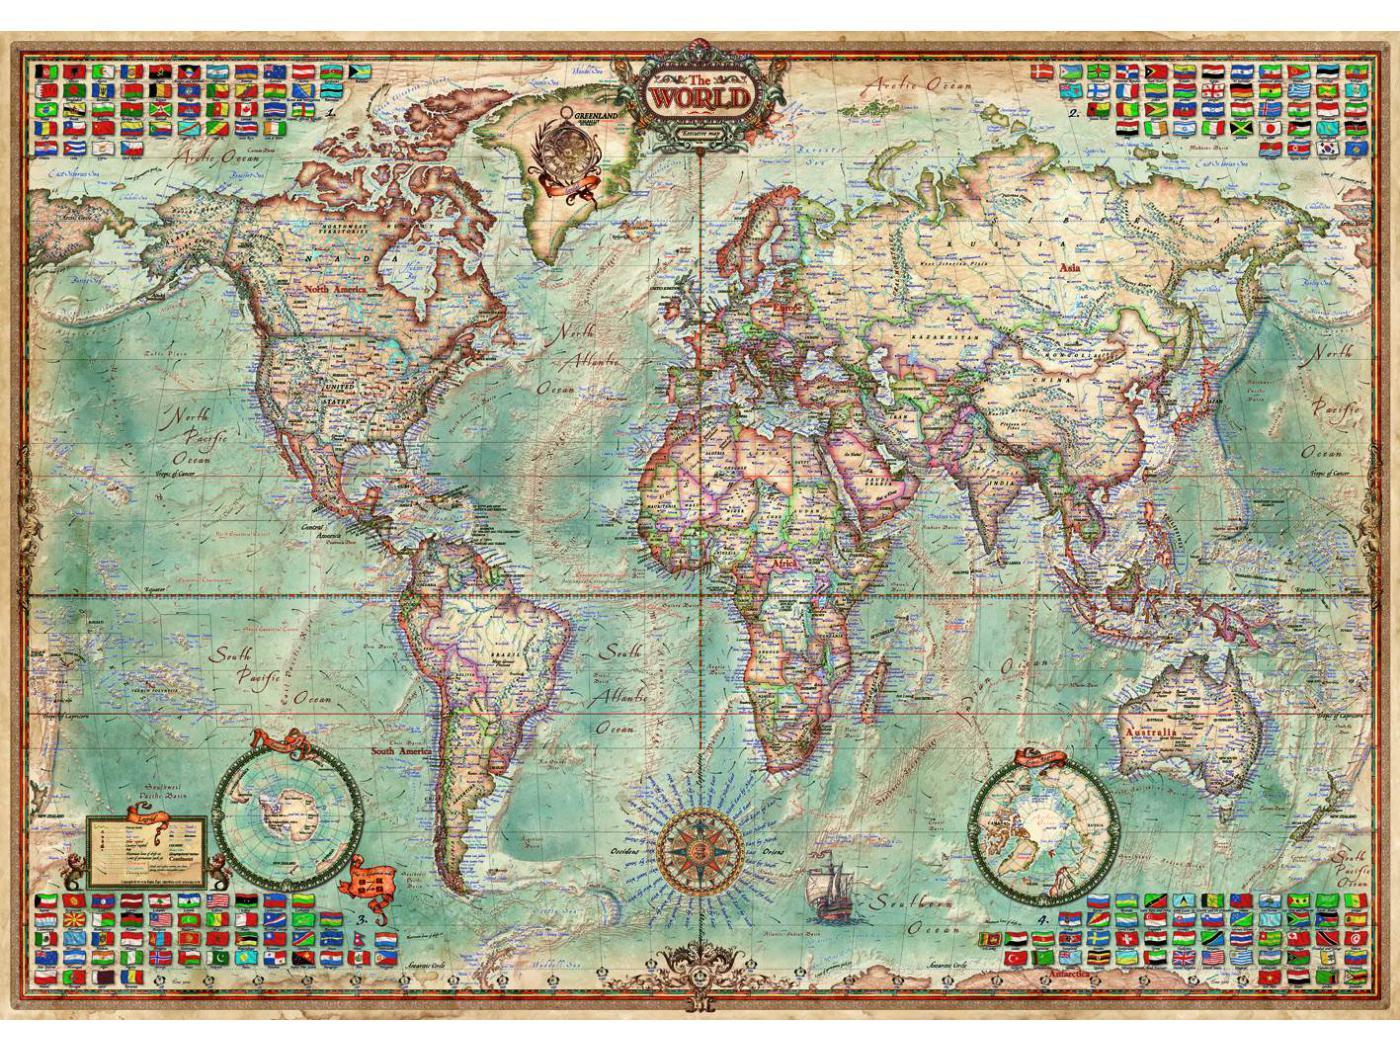 La Plus Belle Carte Du Monde | popkensburg